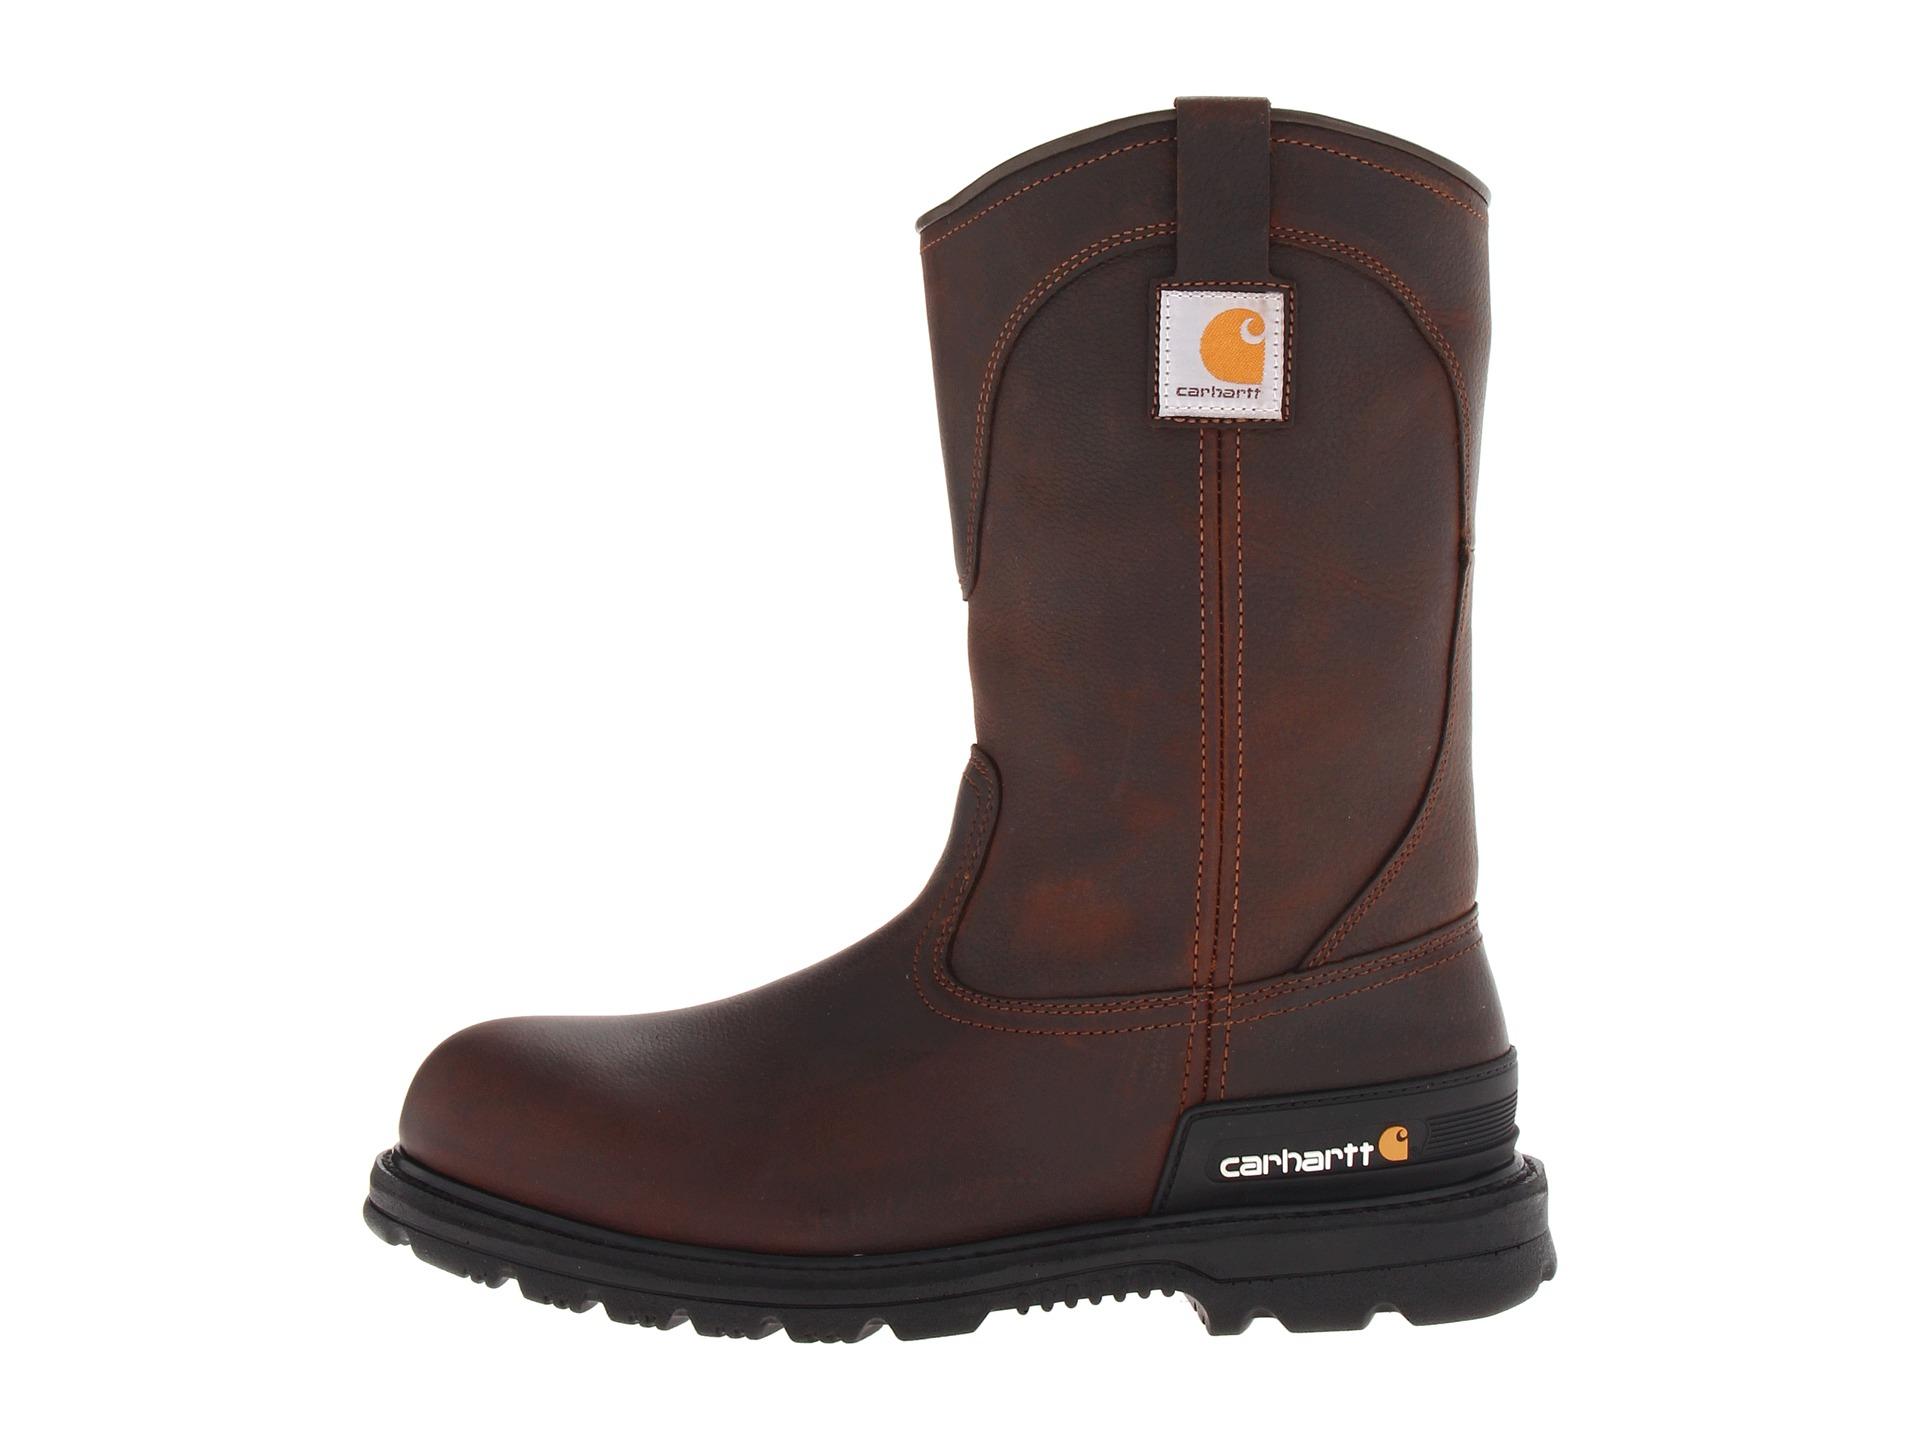 carhartt wellington unlined boot zappos free